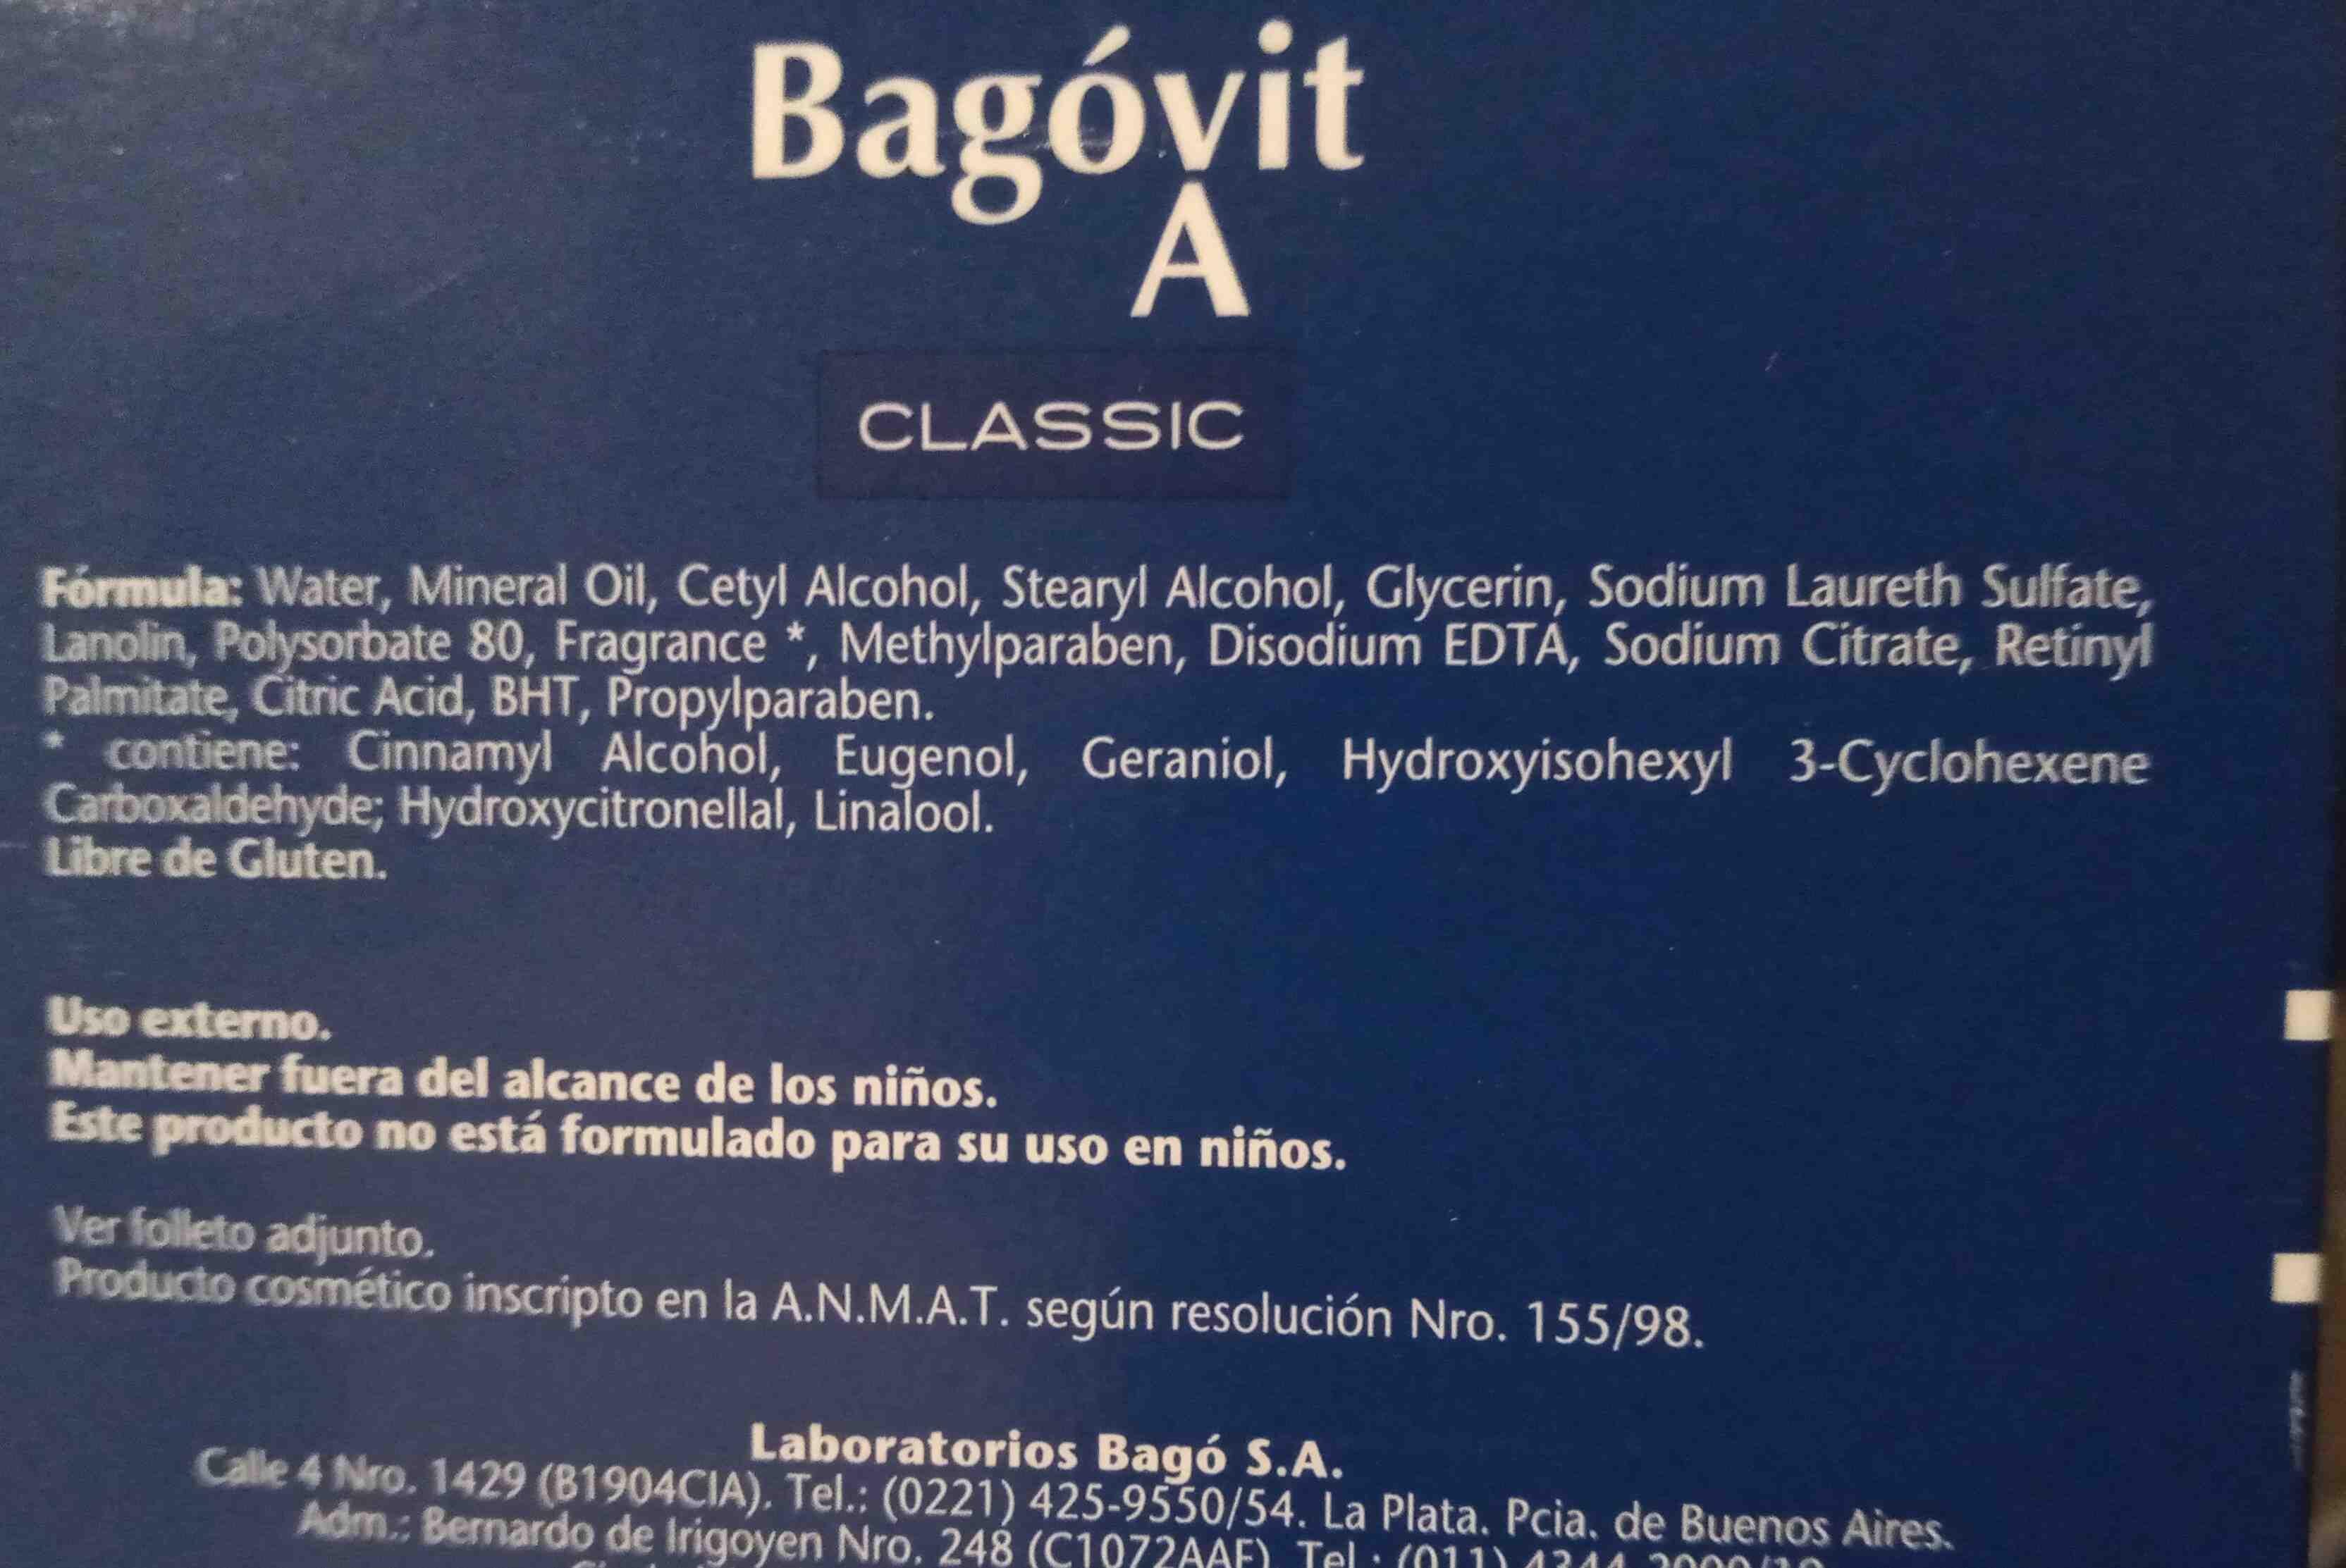 crema bagovit A - Ingredienti - en